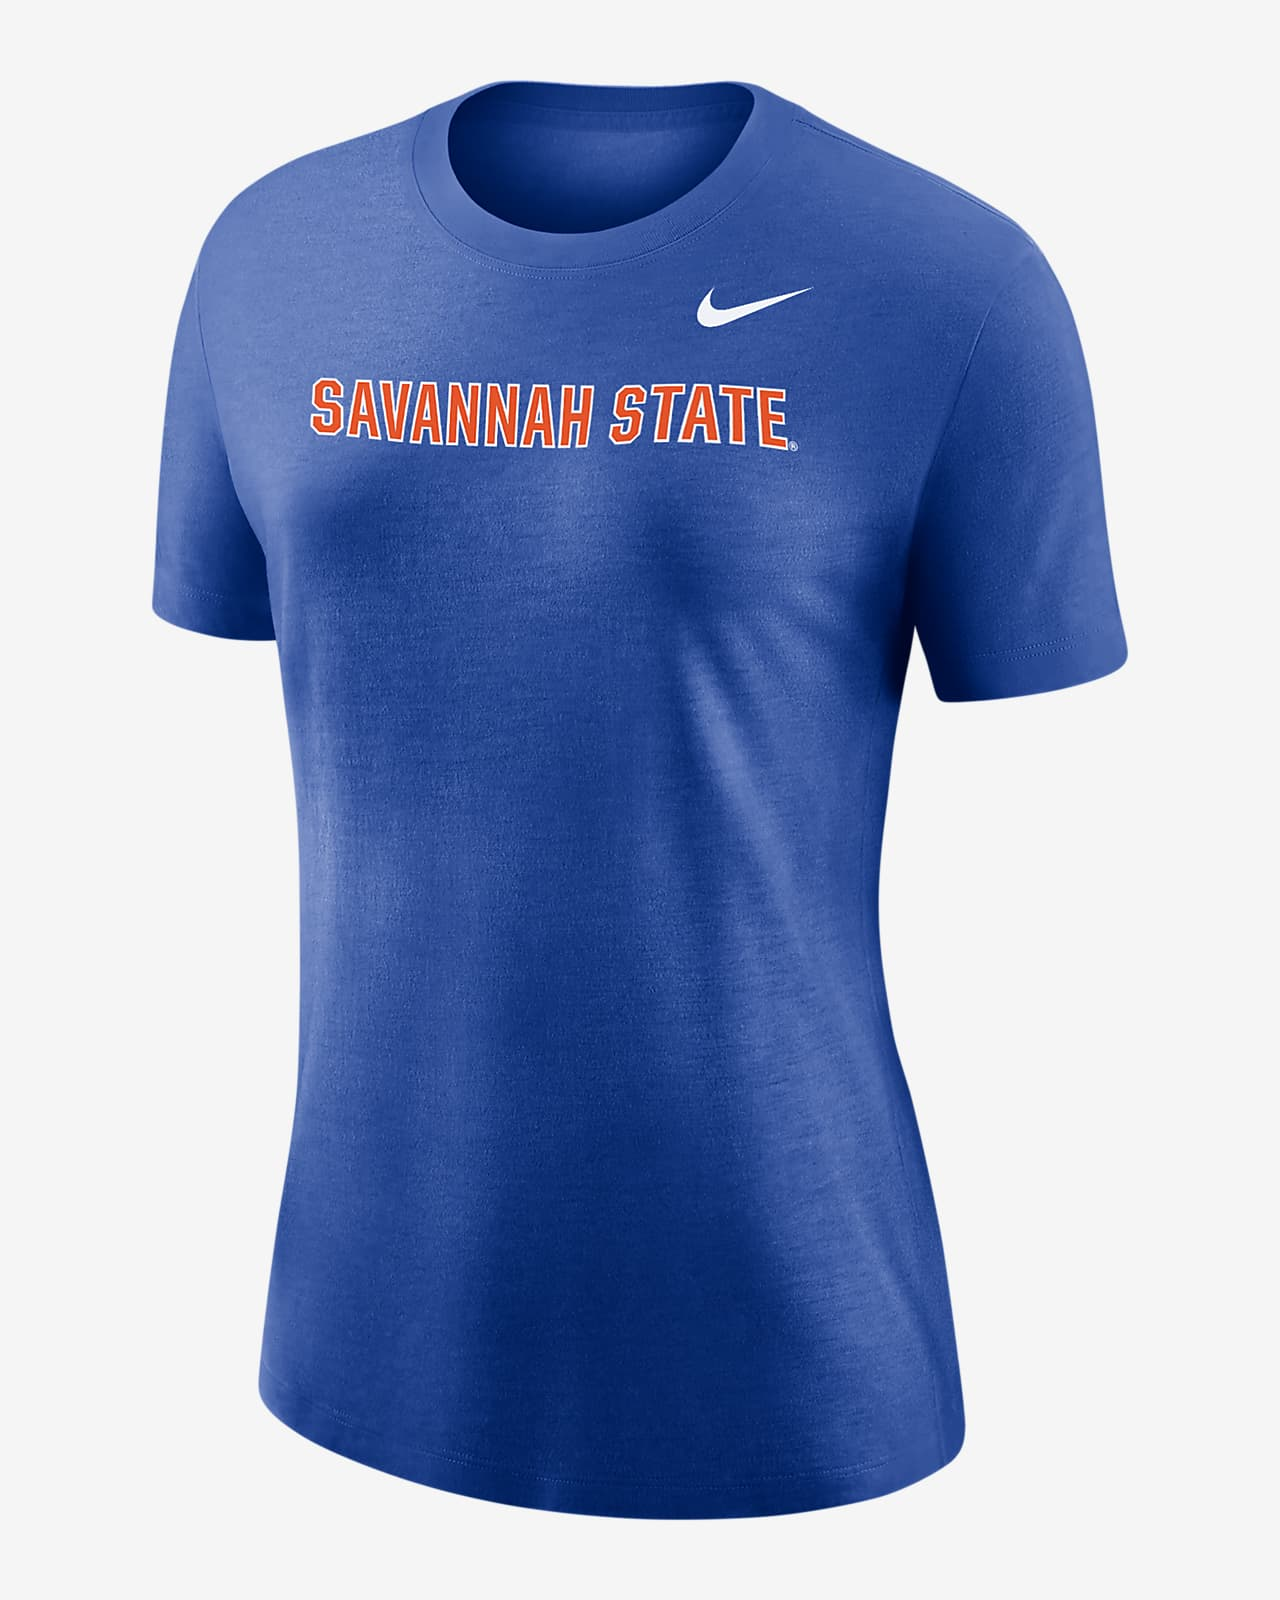 Nike College (Savannah State) Women's T-Shirt